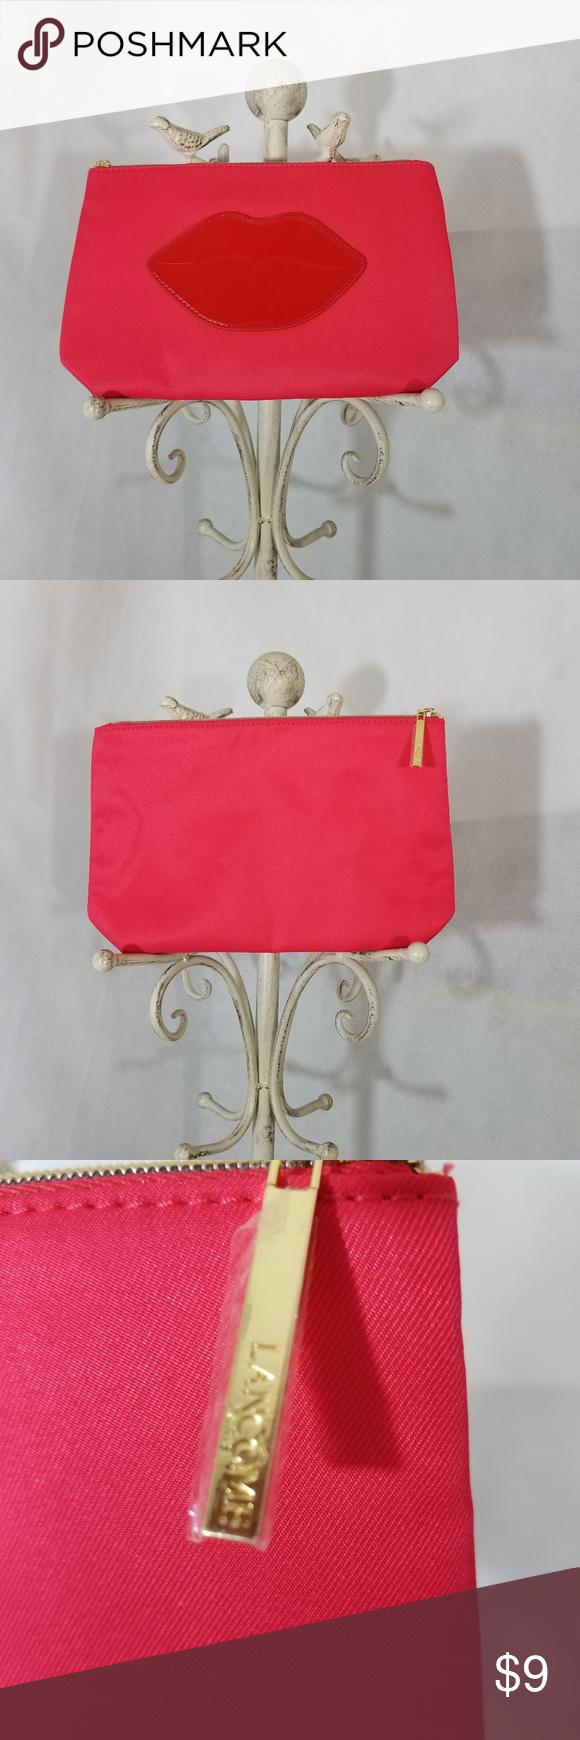 Makeup Bag Lips Cute cosmetic bag, hot pink with